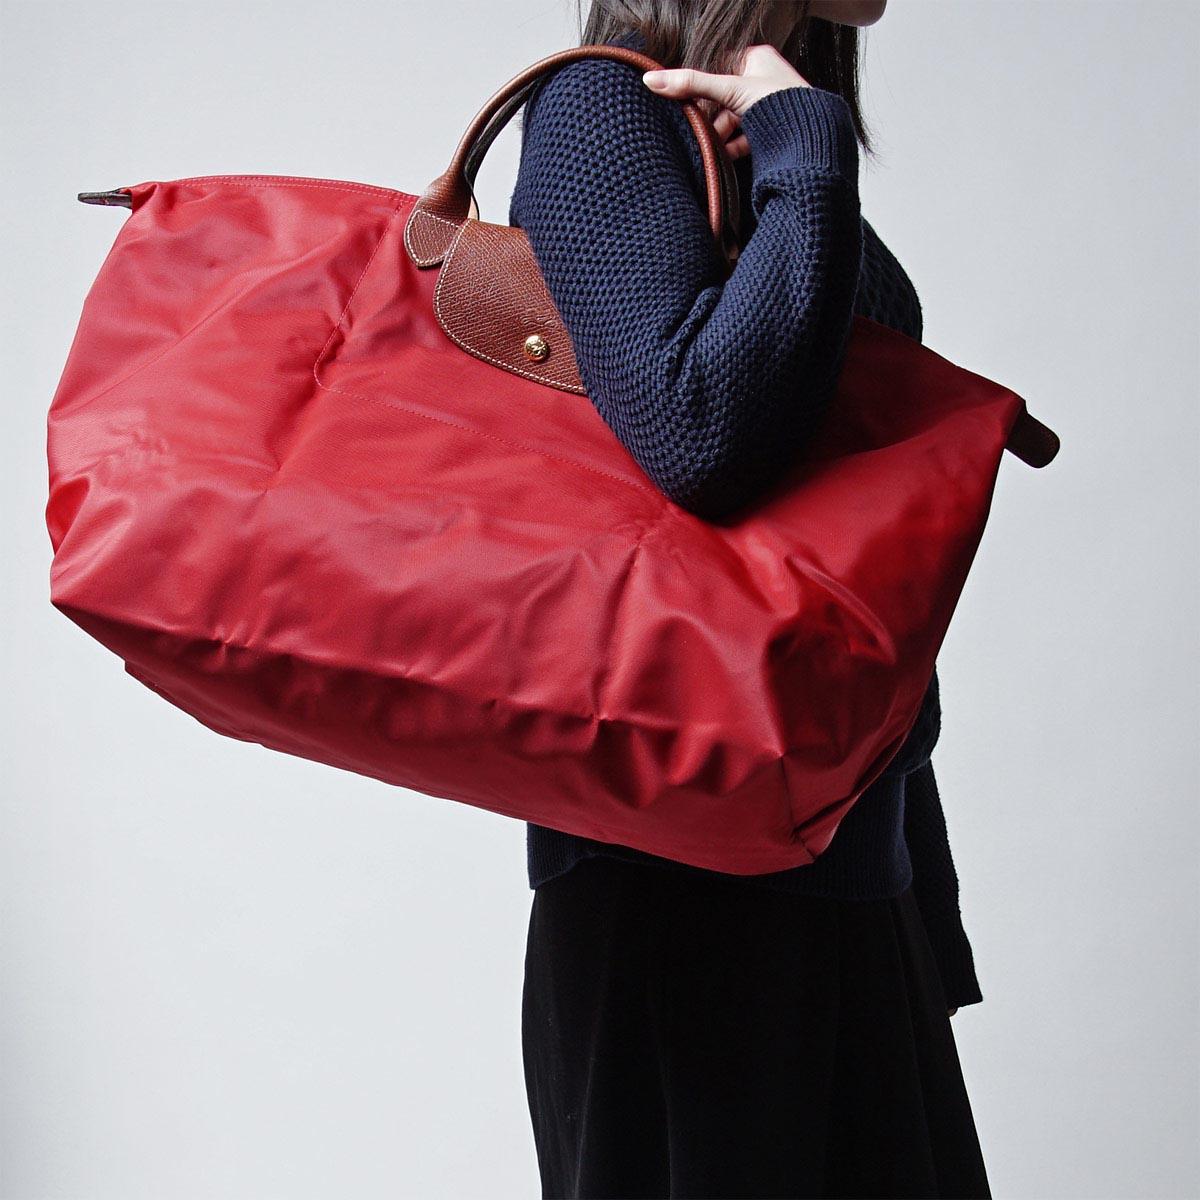 Best Buy Longchamp Le Pliage Tote Bags 2605 089 841 Beige moye